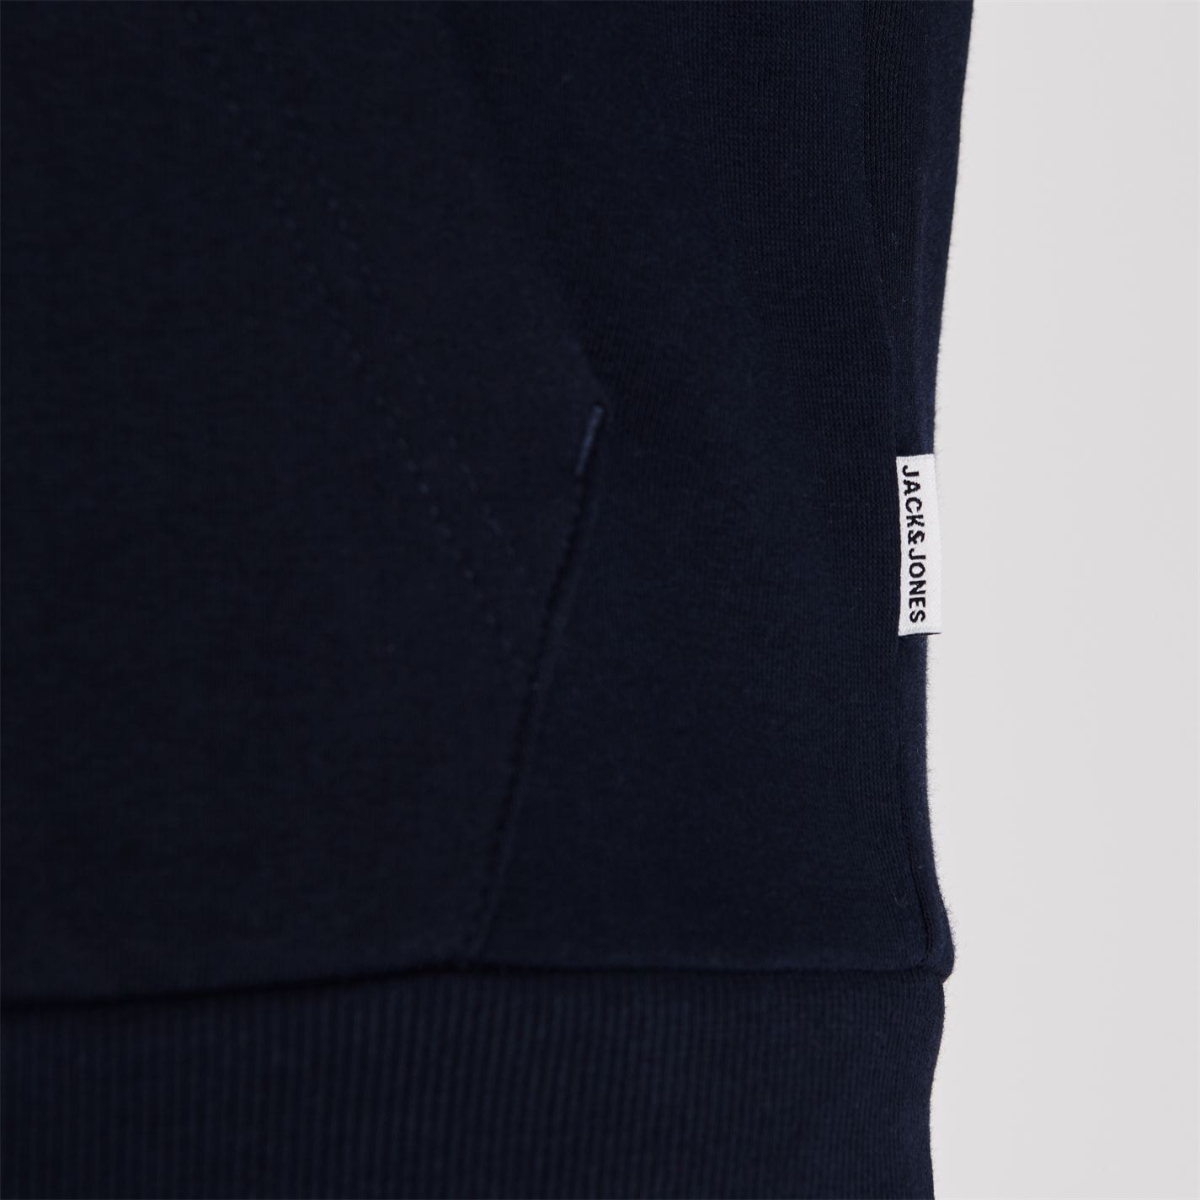 Jack And Jones Kapuzenjacke Jacke Herren Sweatshirt Kapuzenpullover Pullover 262